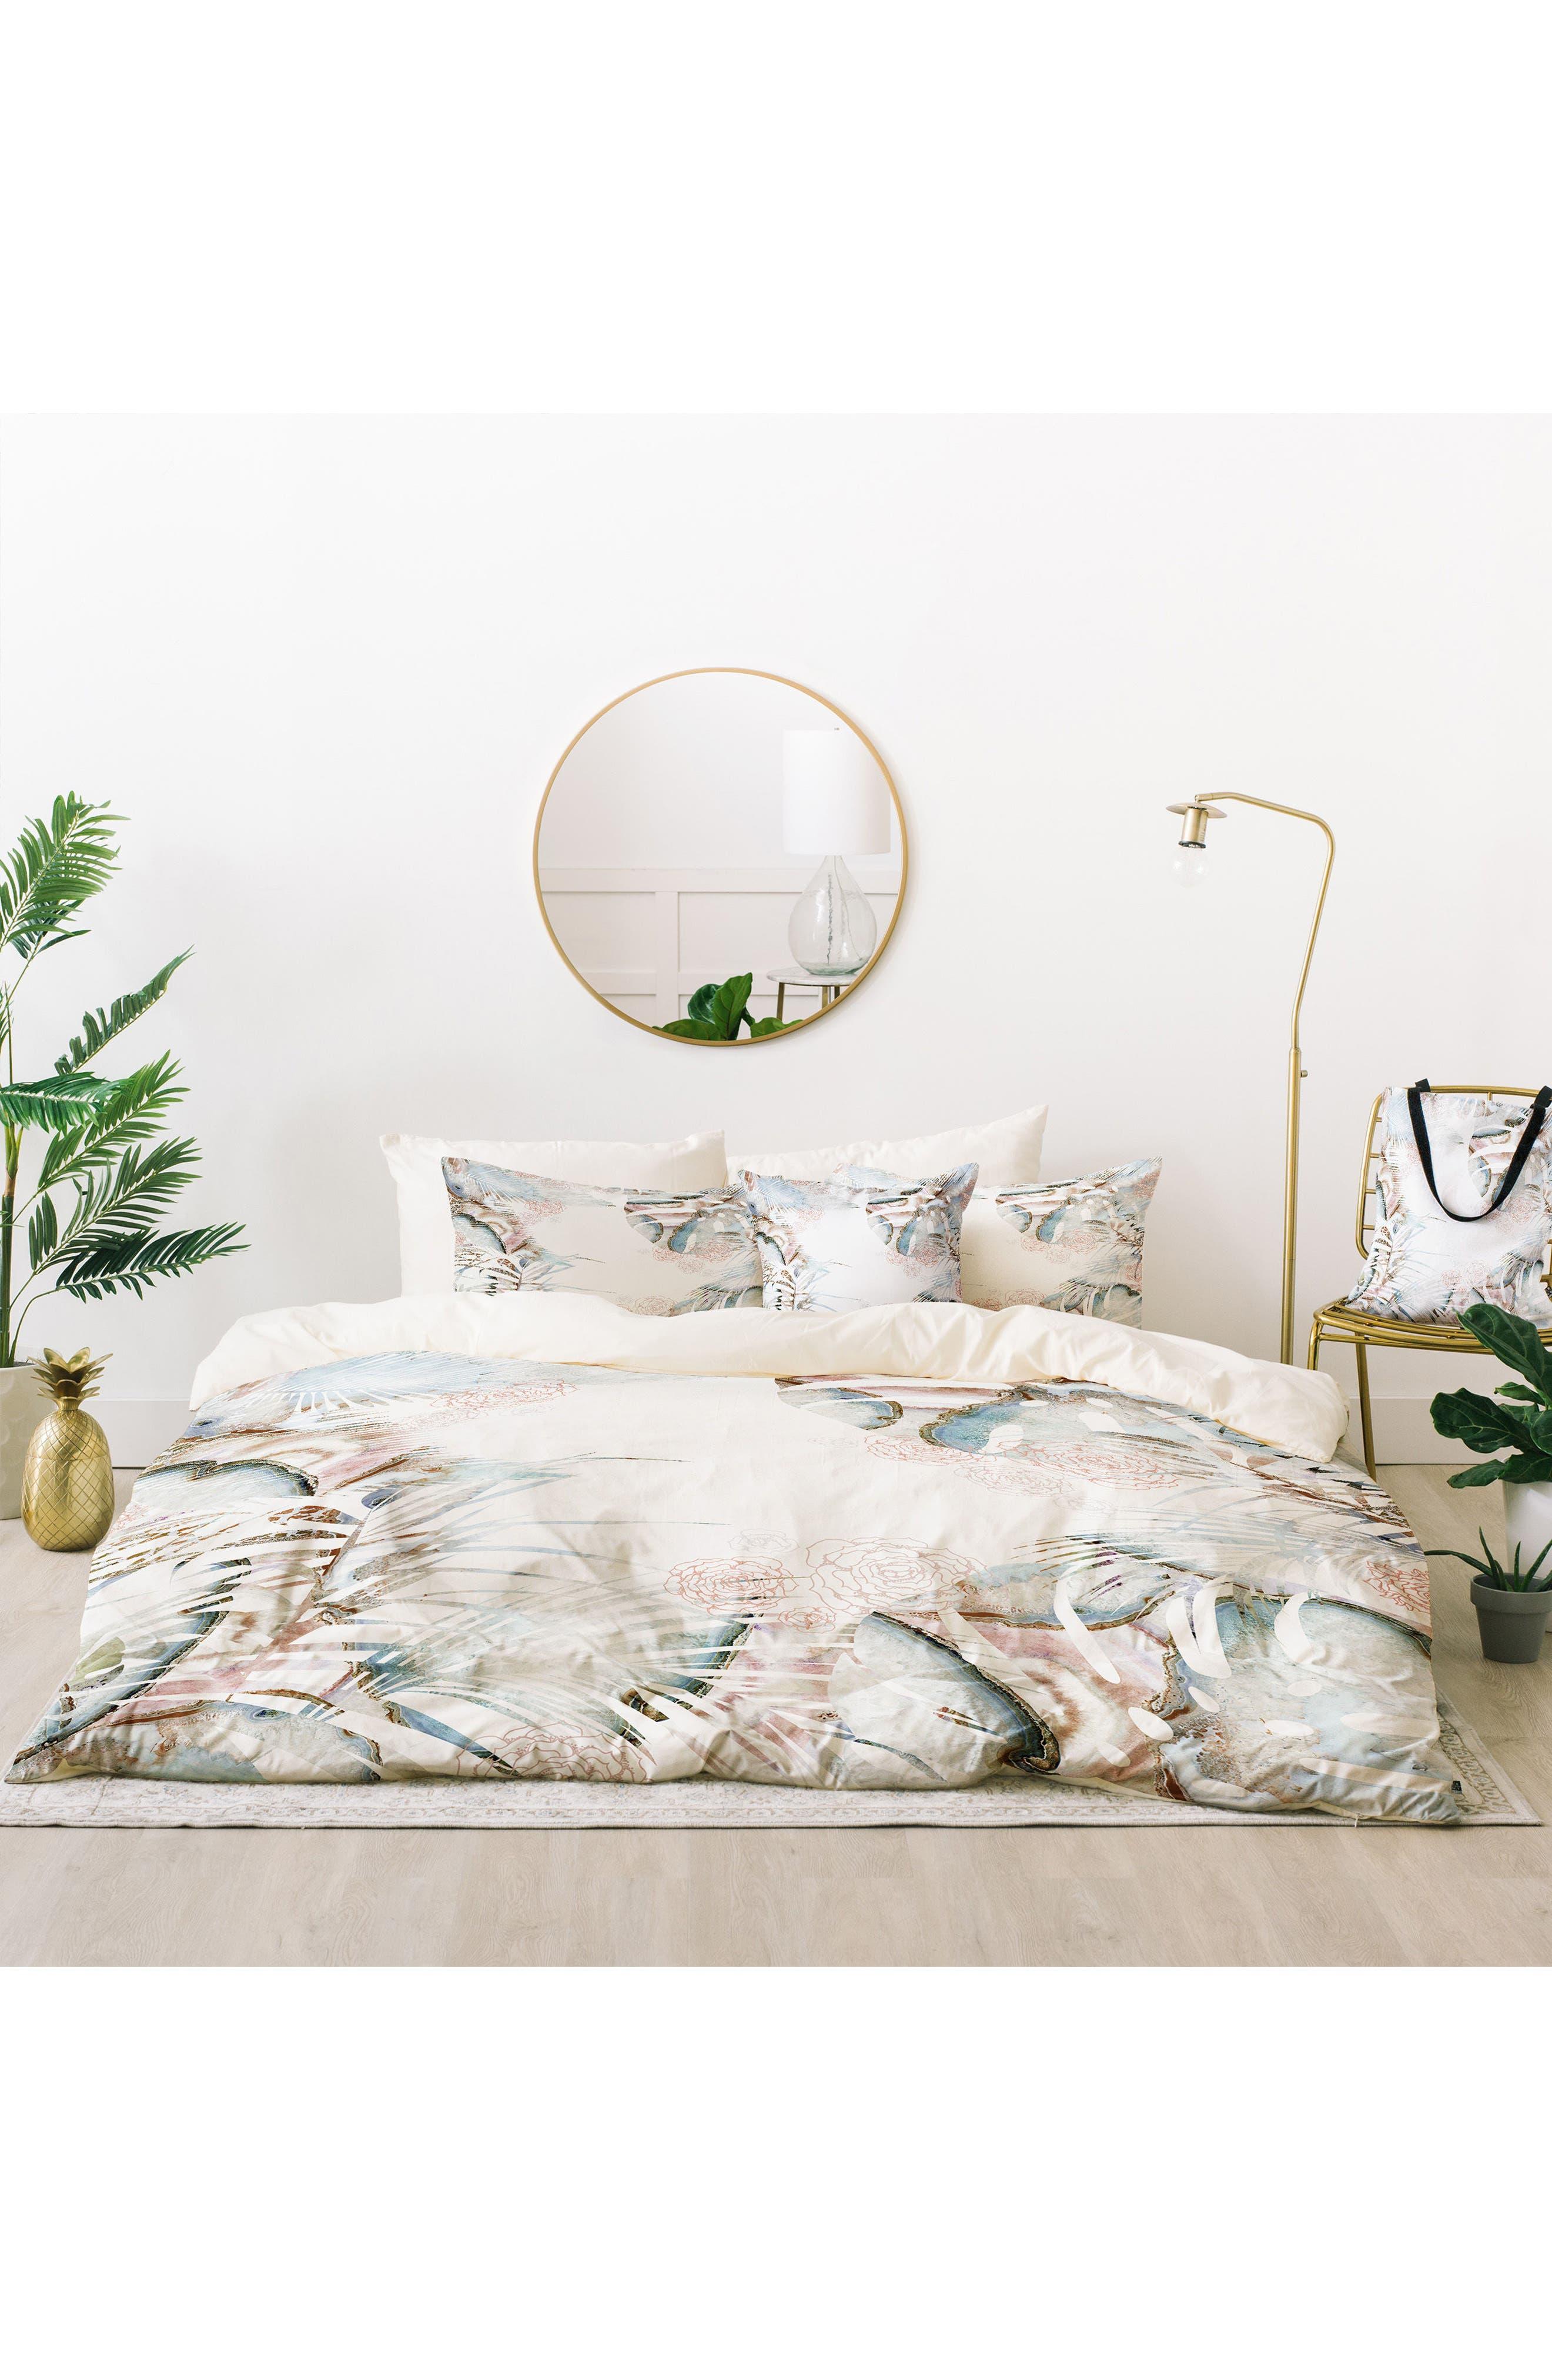 Iveta Abolina Honey It's Nap Time Bed in a Bag Duvet Cover, Sham & Accent Pillow Set,                             Main thumbnail 1, color,                             400